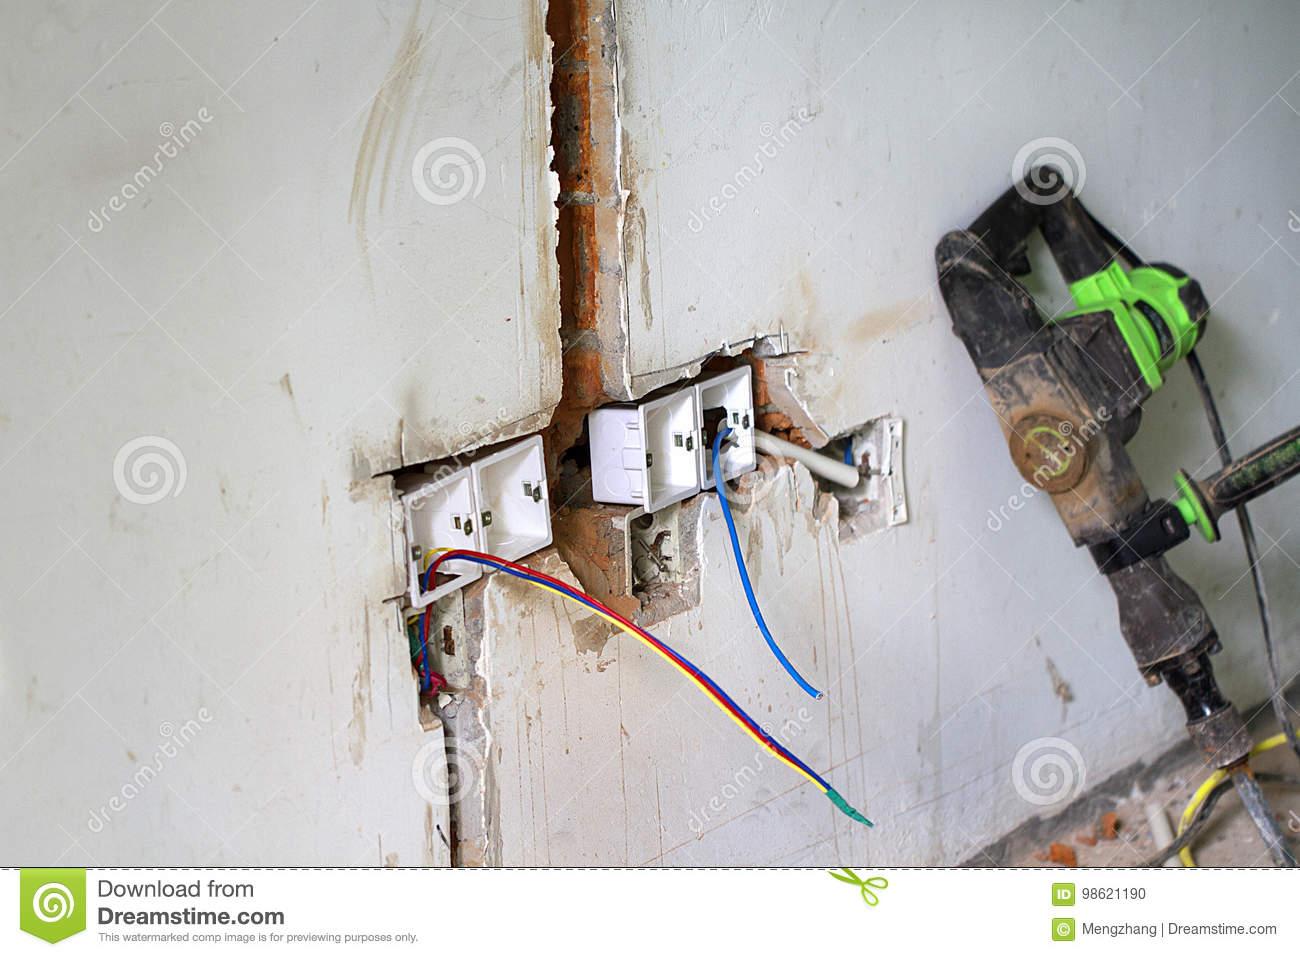 Surprising Electrical Renovation Work Light Switch Stock Photo Image Of Home Wiring Cloud Loplapiotaidewilluminateatxorg